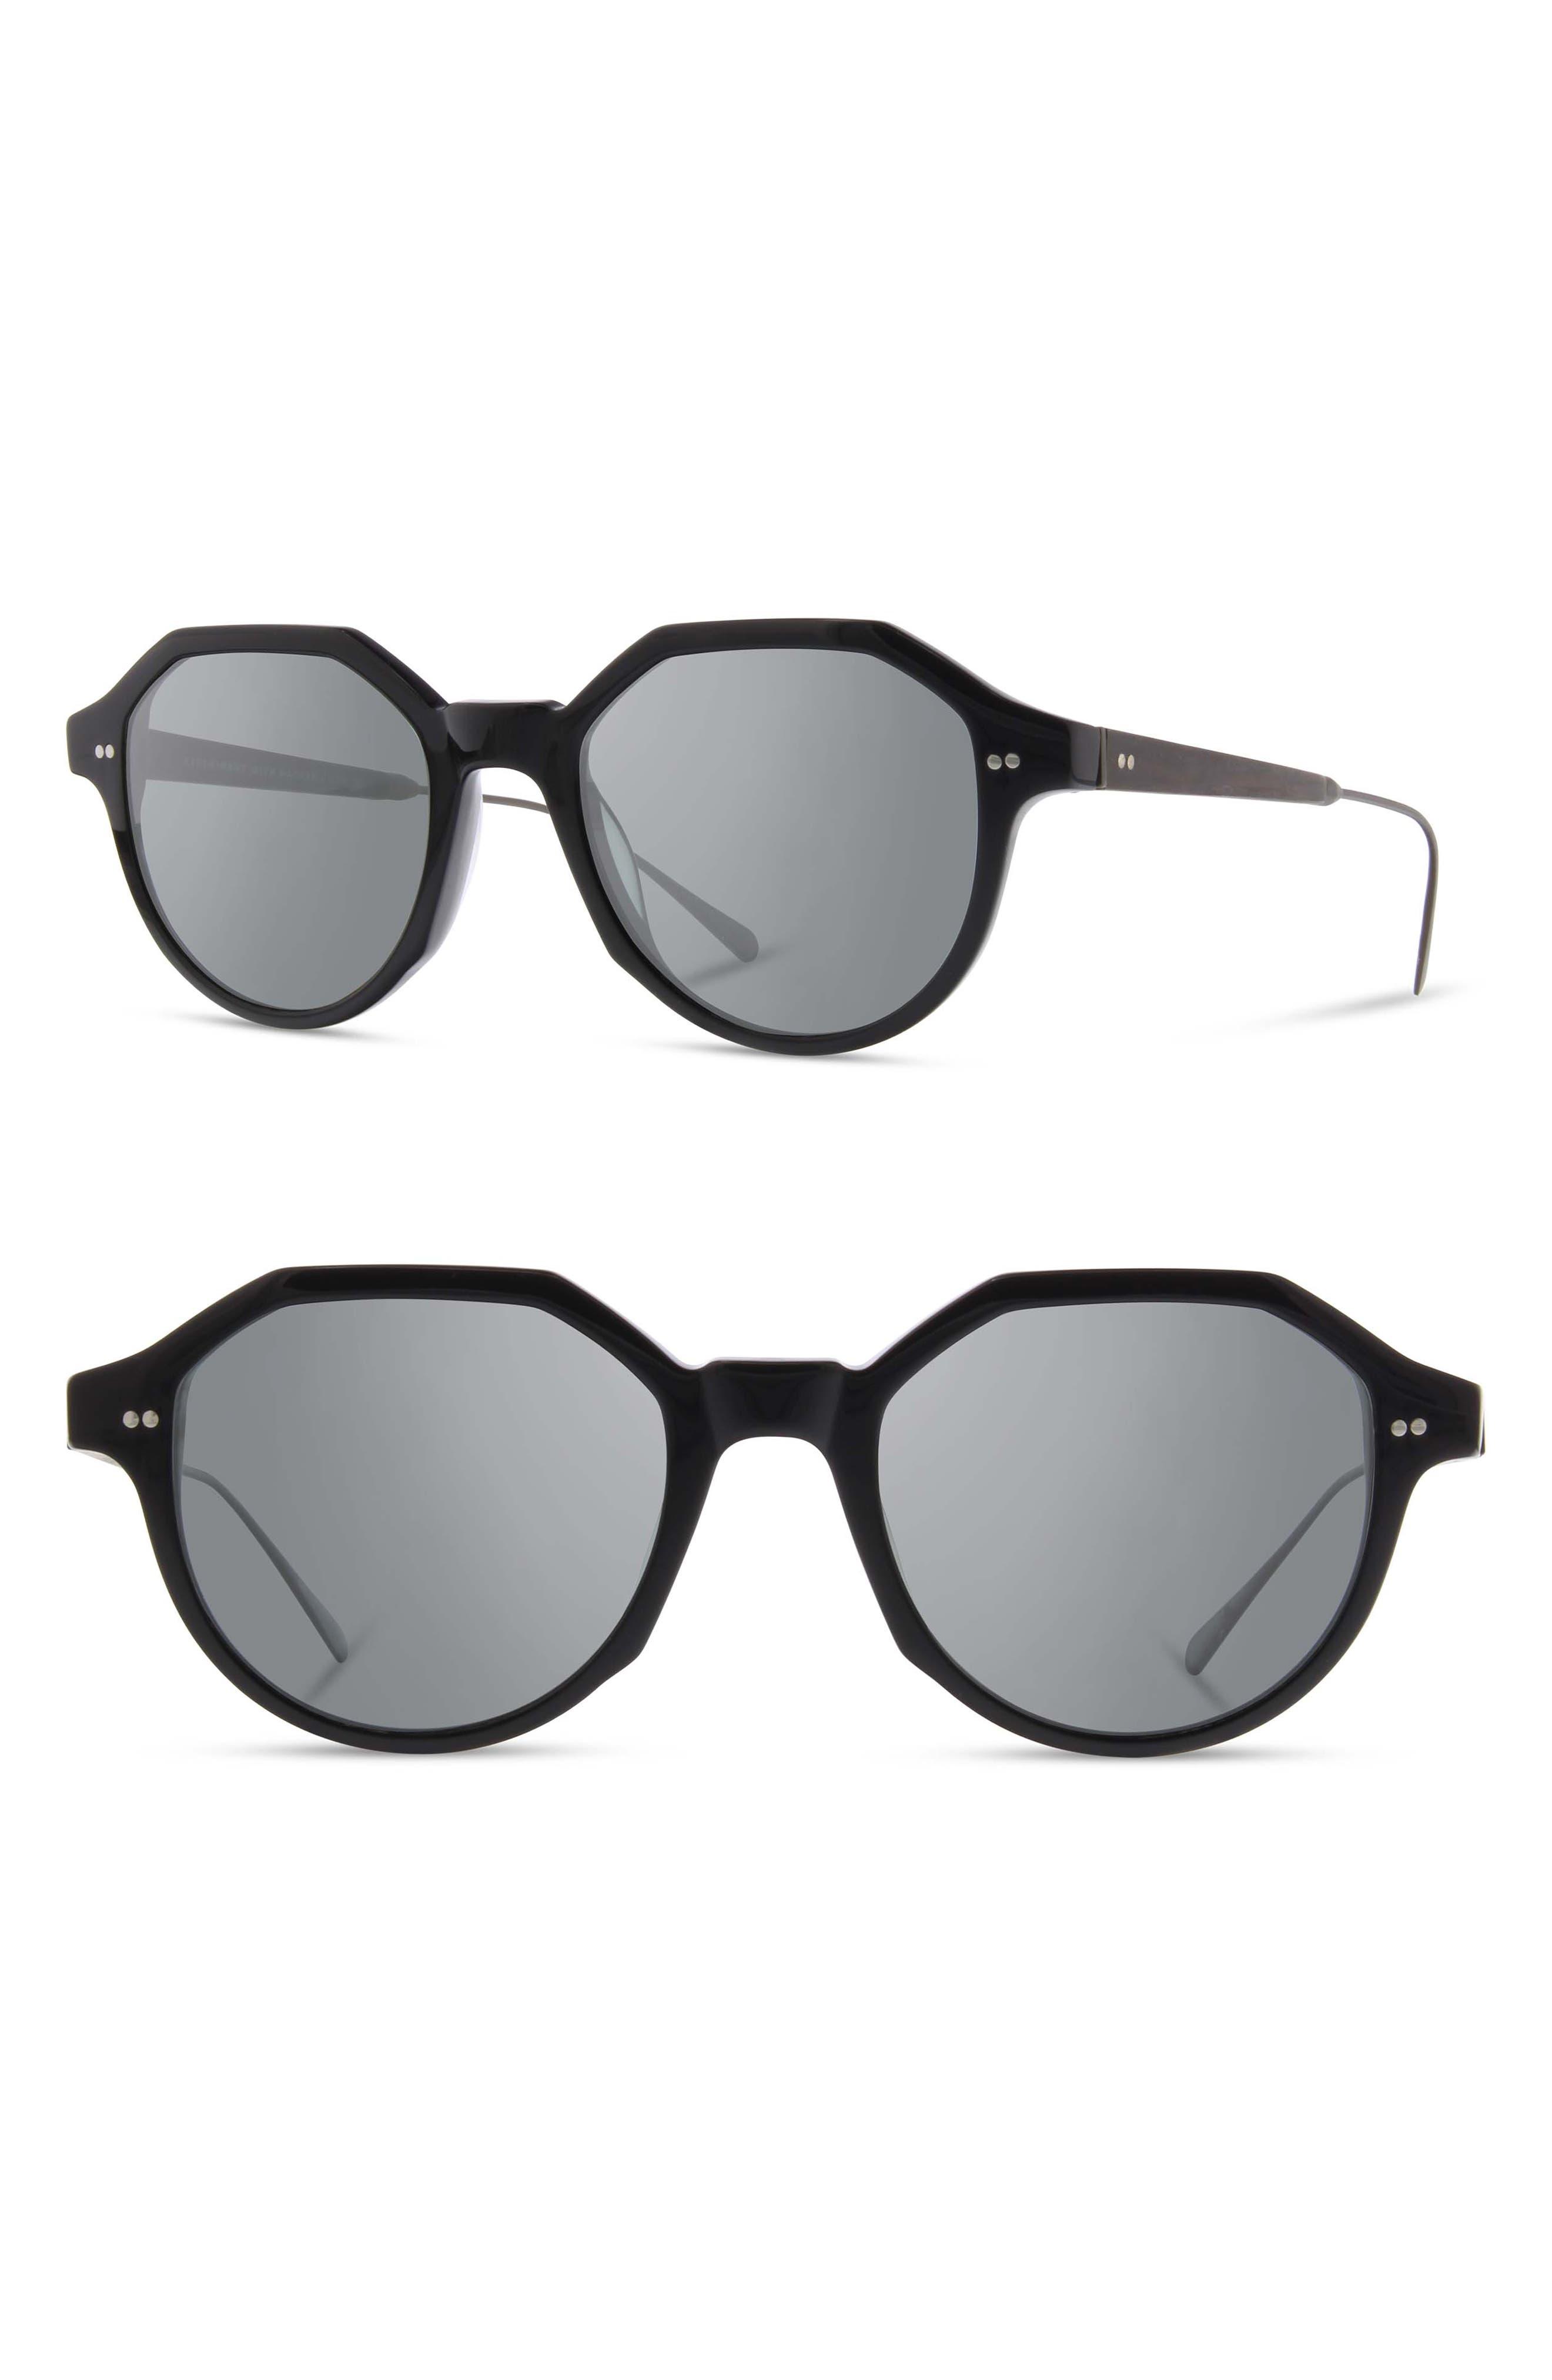 SHWOOD Powell 50Mm Polarized Geometric Sunglasses - Black/ Gunmetal/ Ebony/ Grey